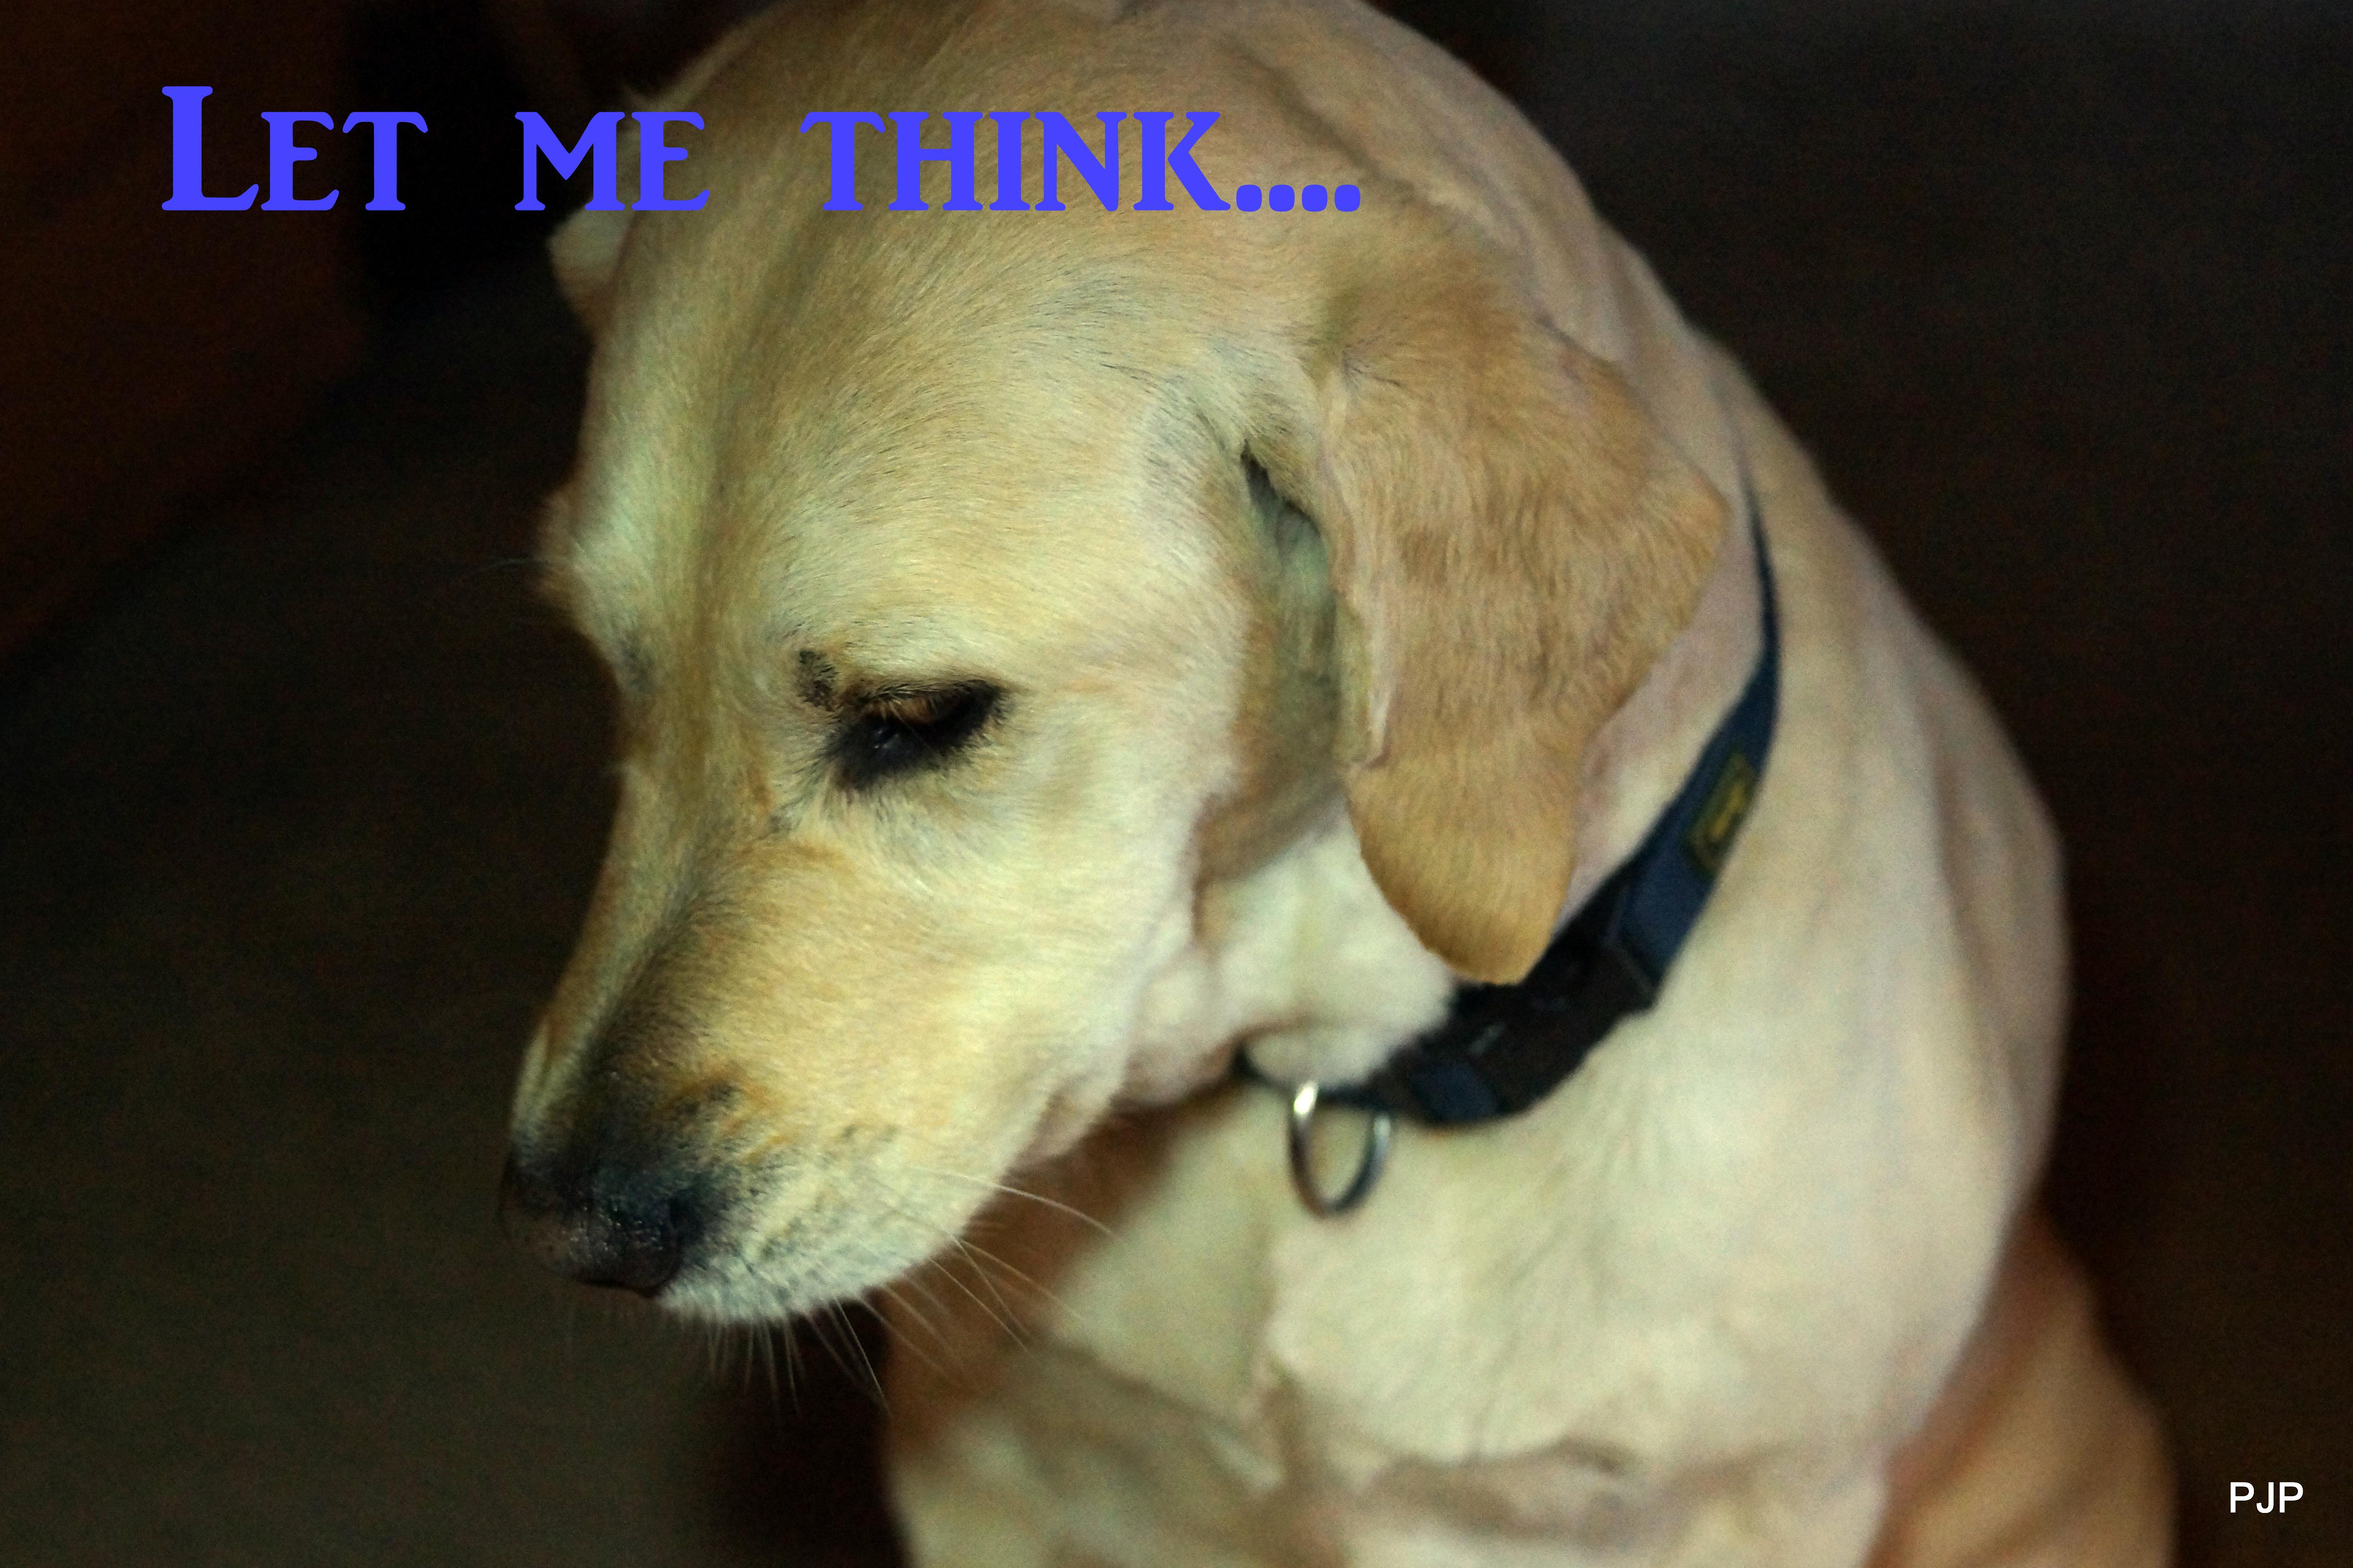 003-Let me think..